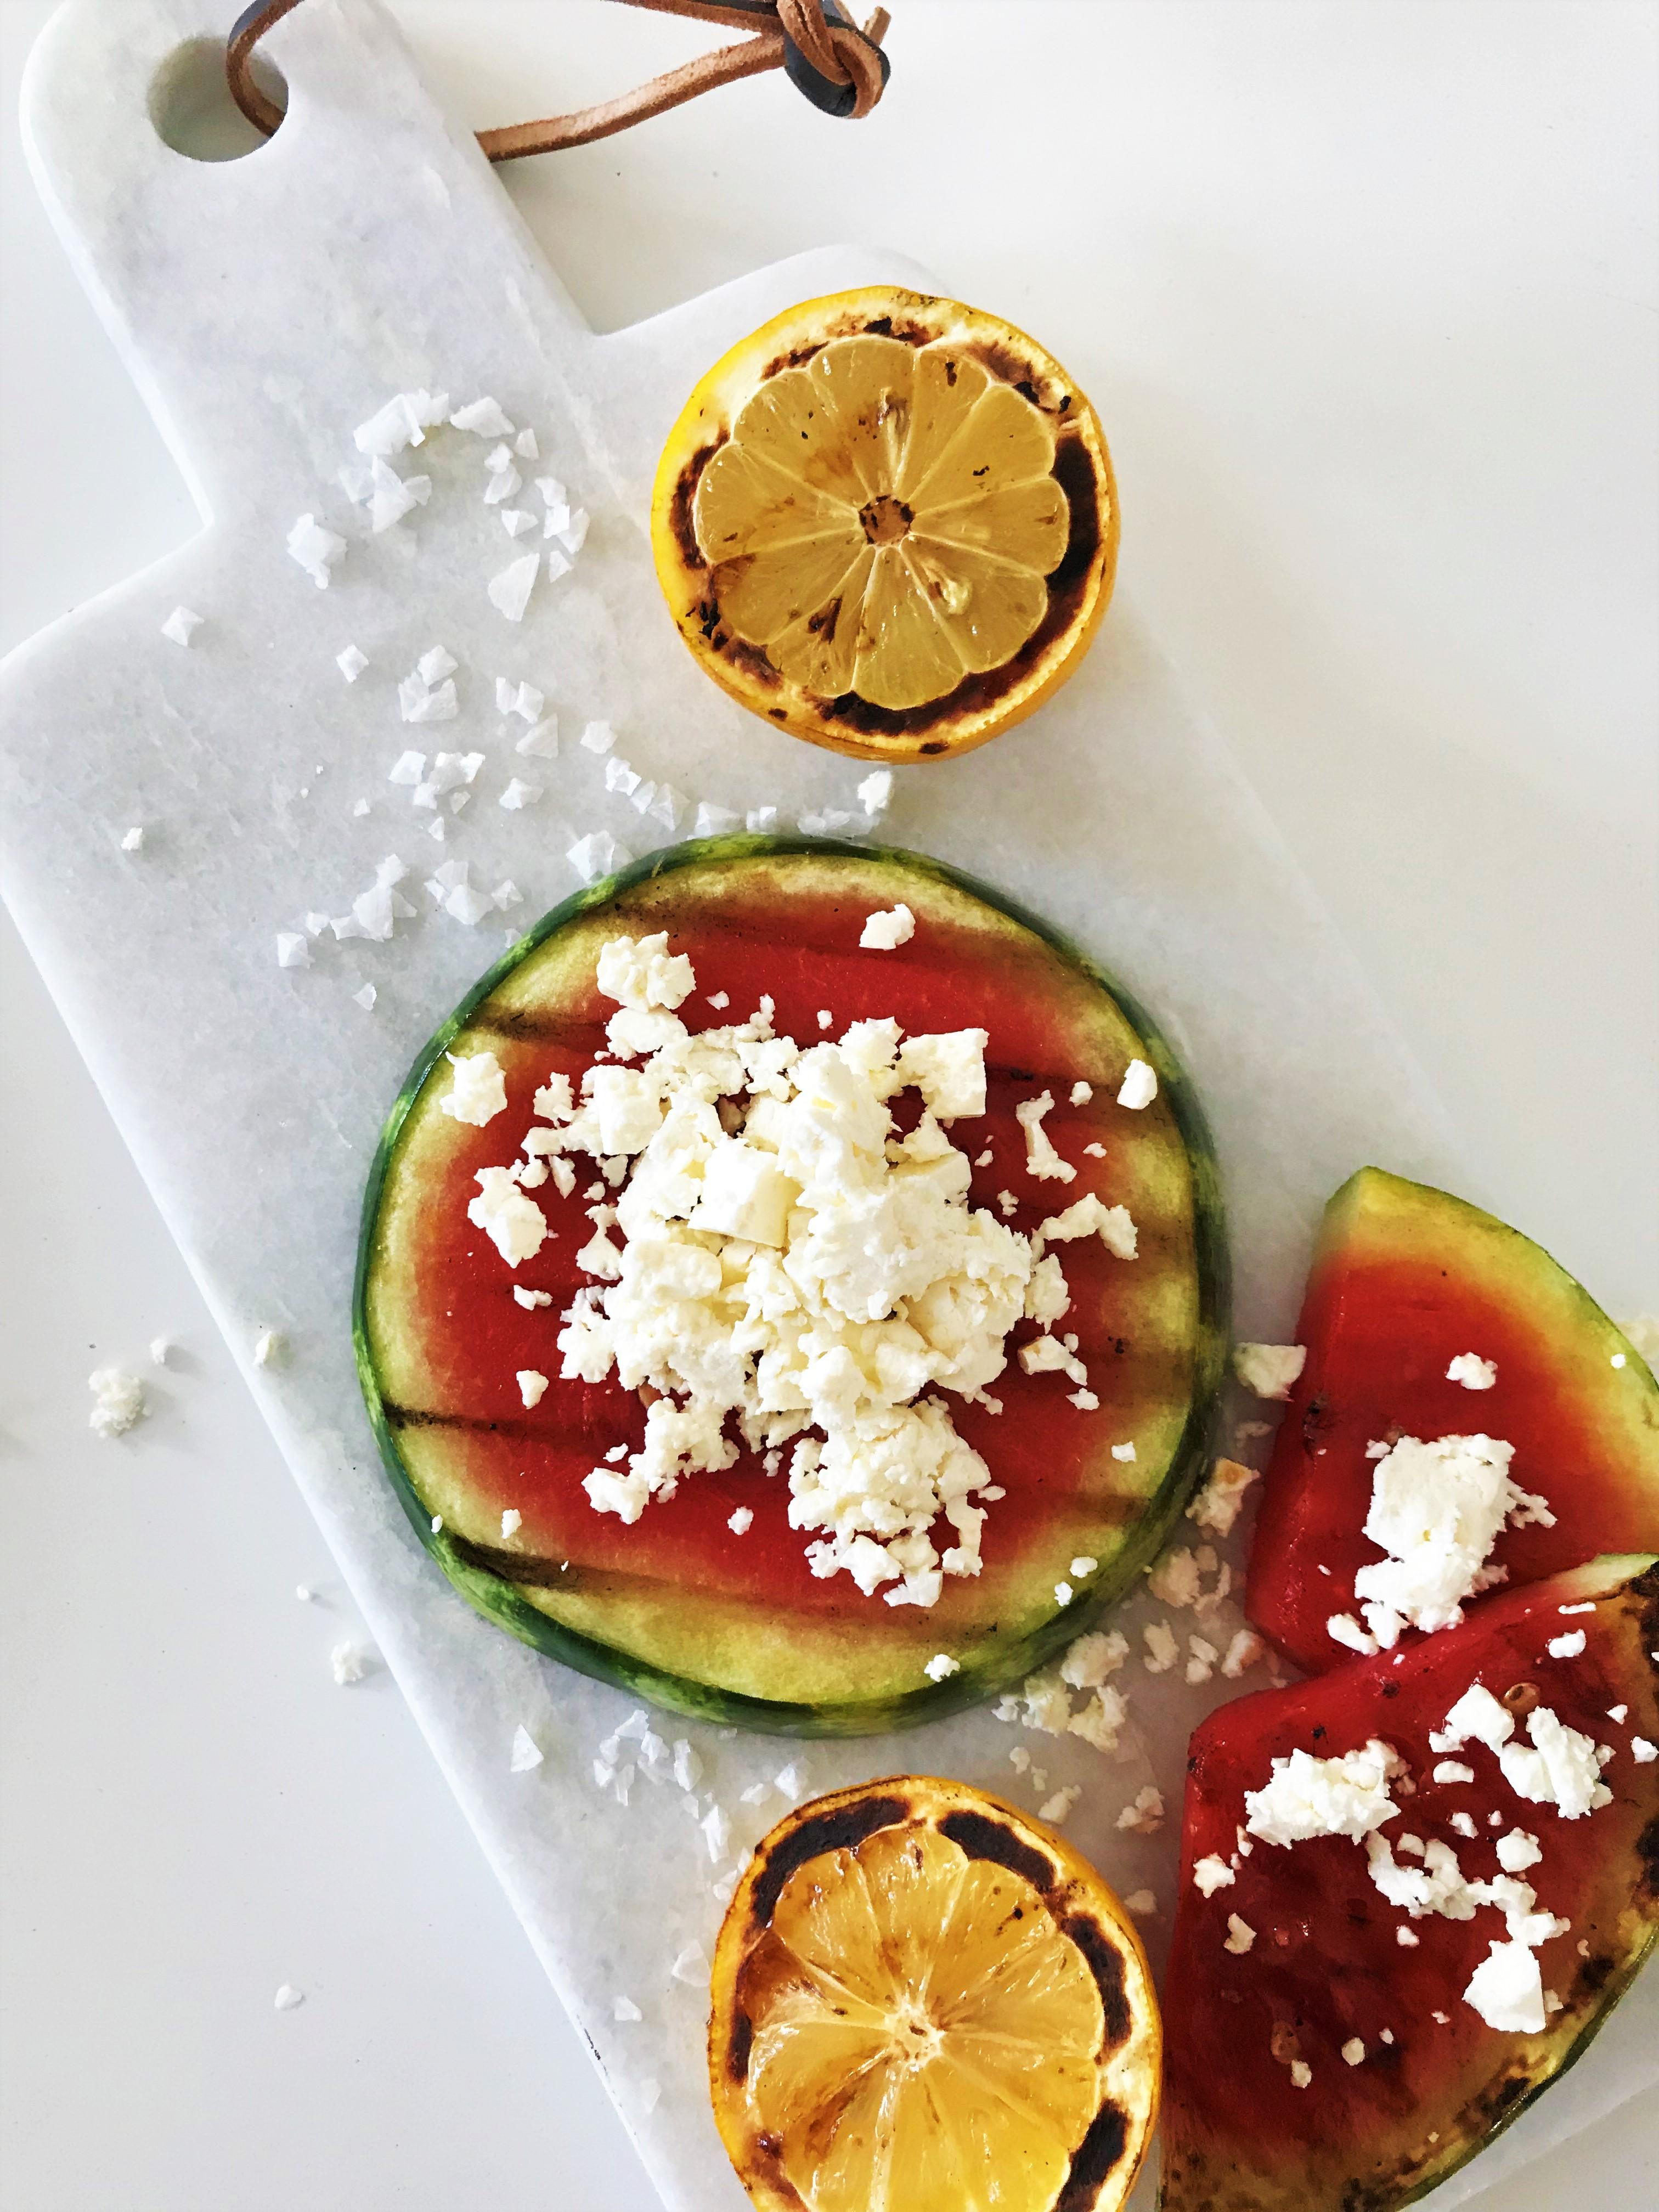 grillad vattenmelon matmedsofie